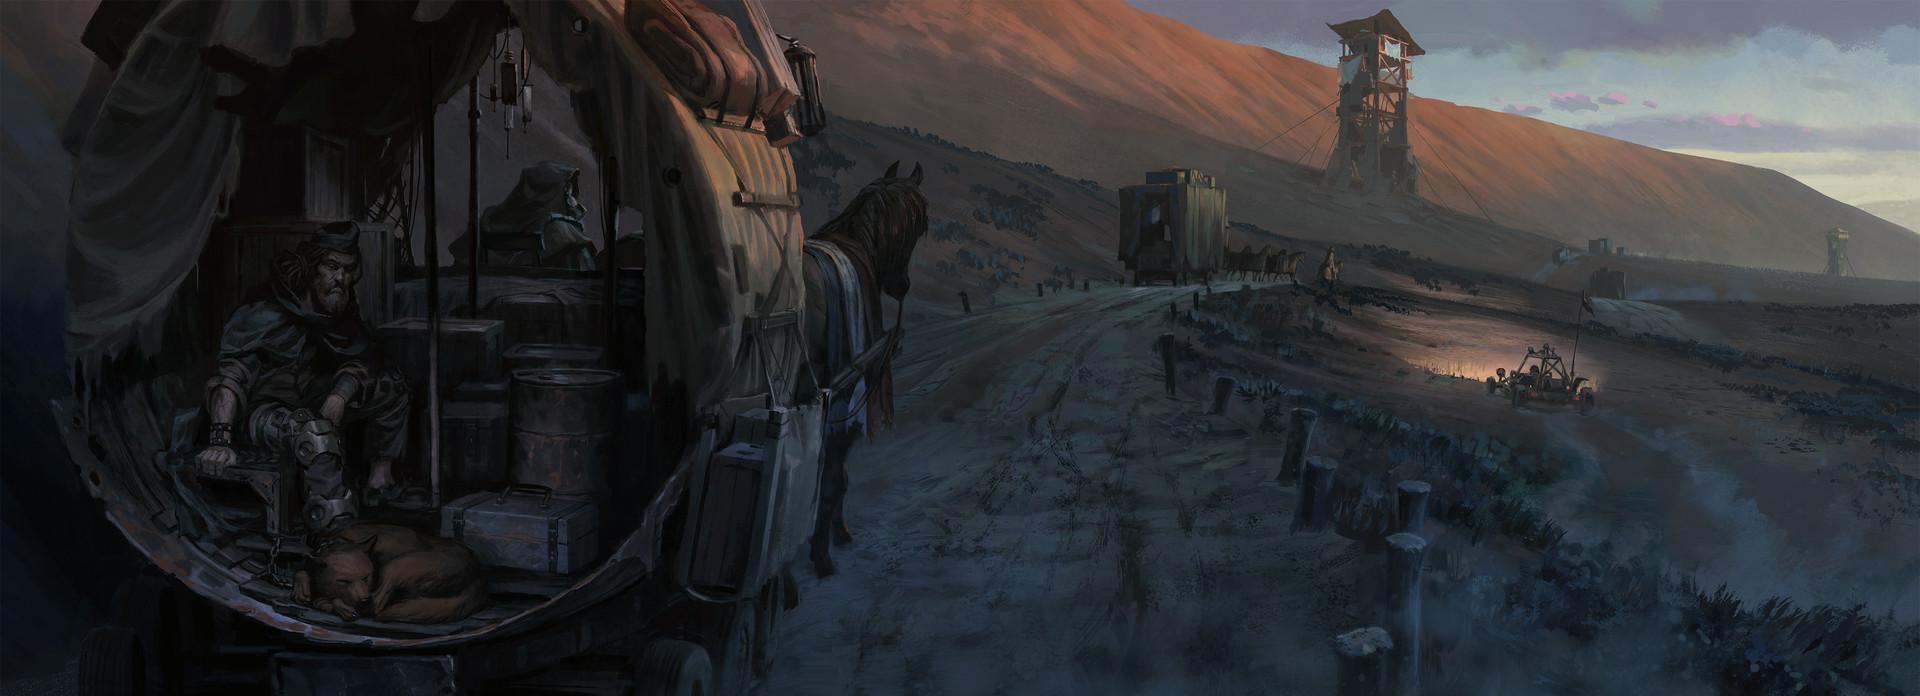 Sixmorevodka studio chapter 01 west of rhone final bleed